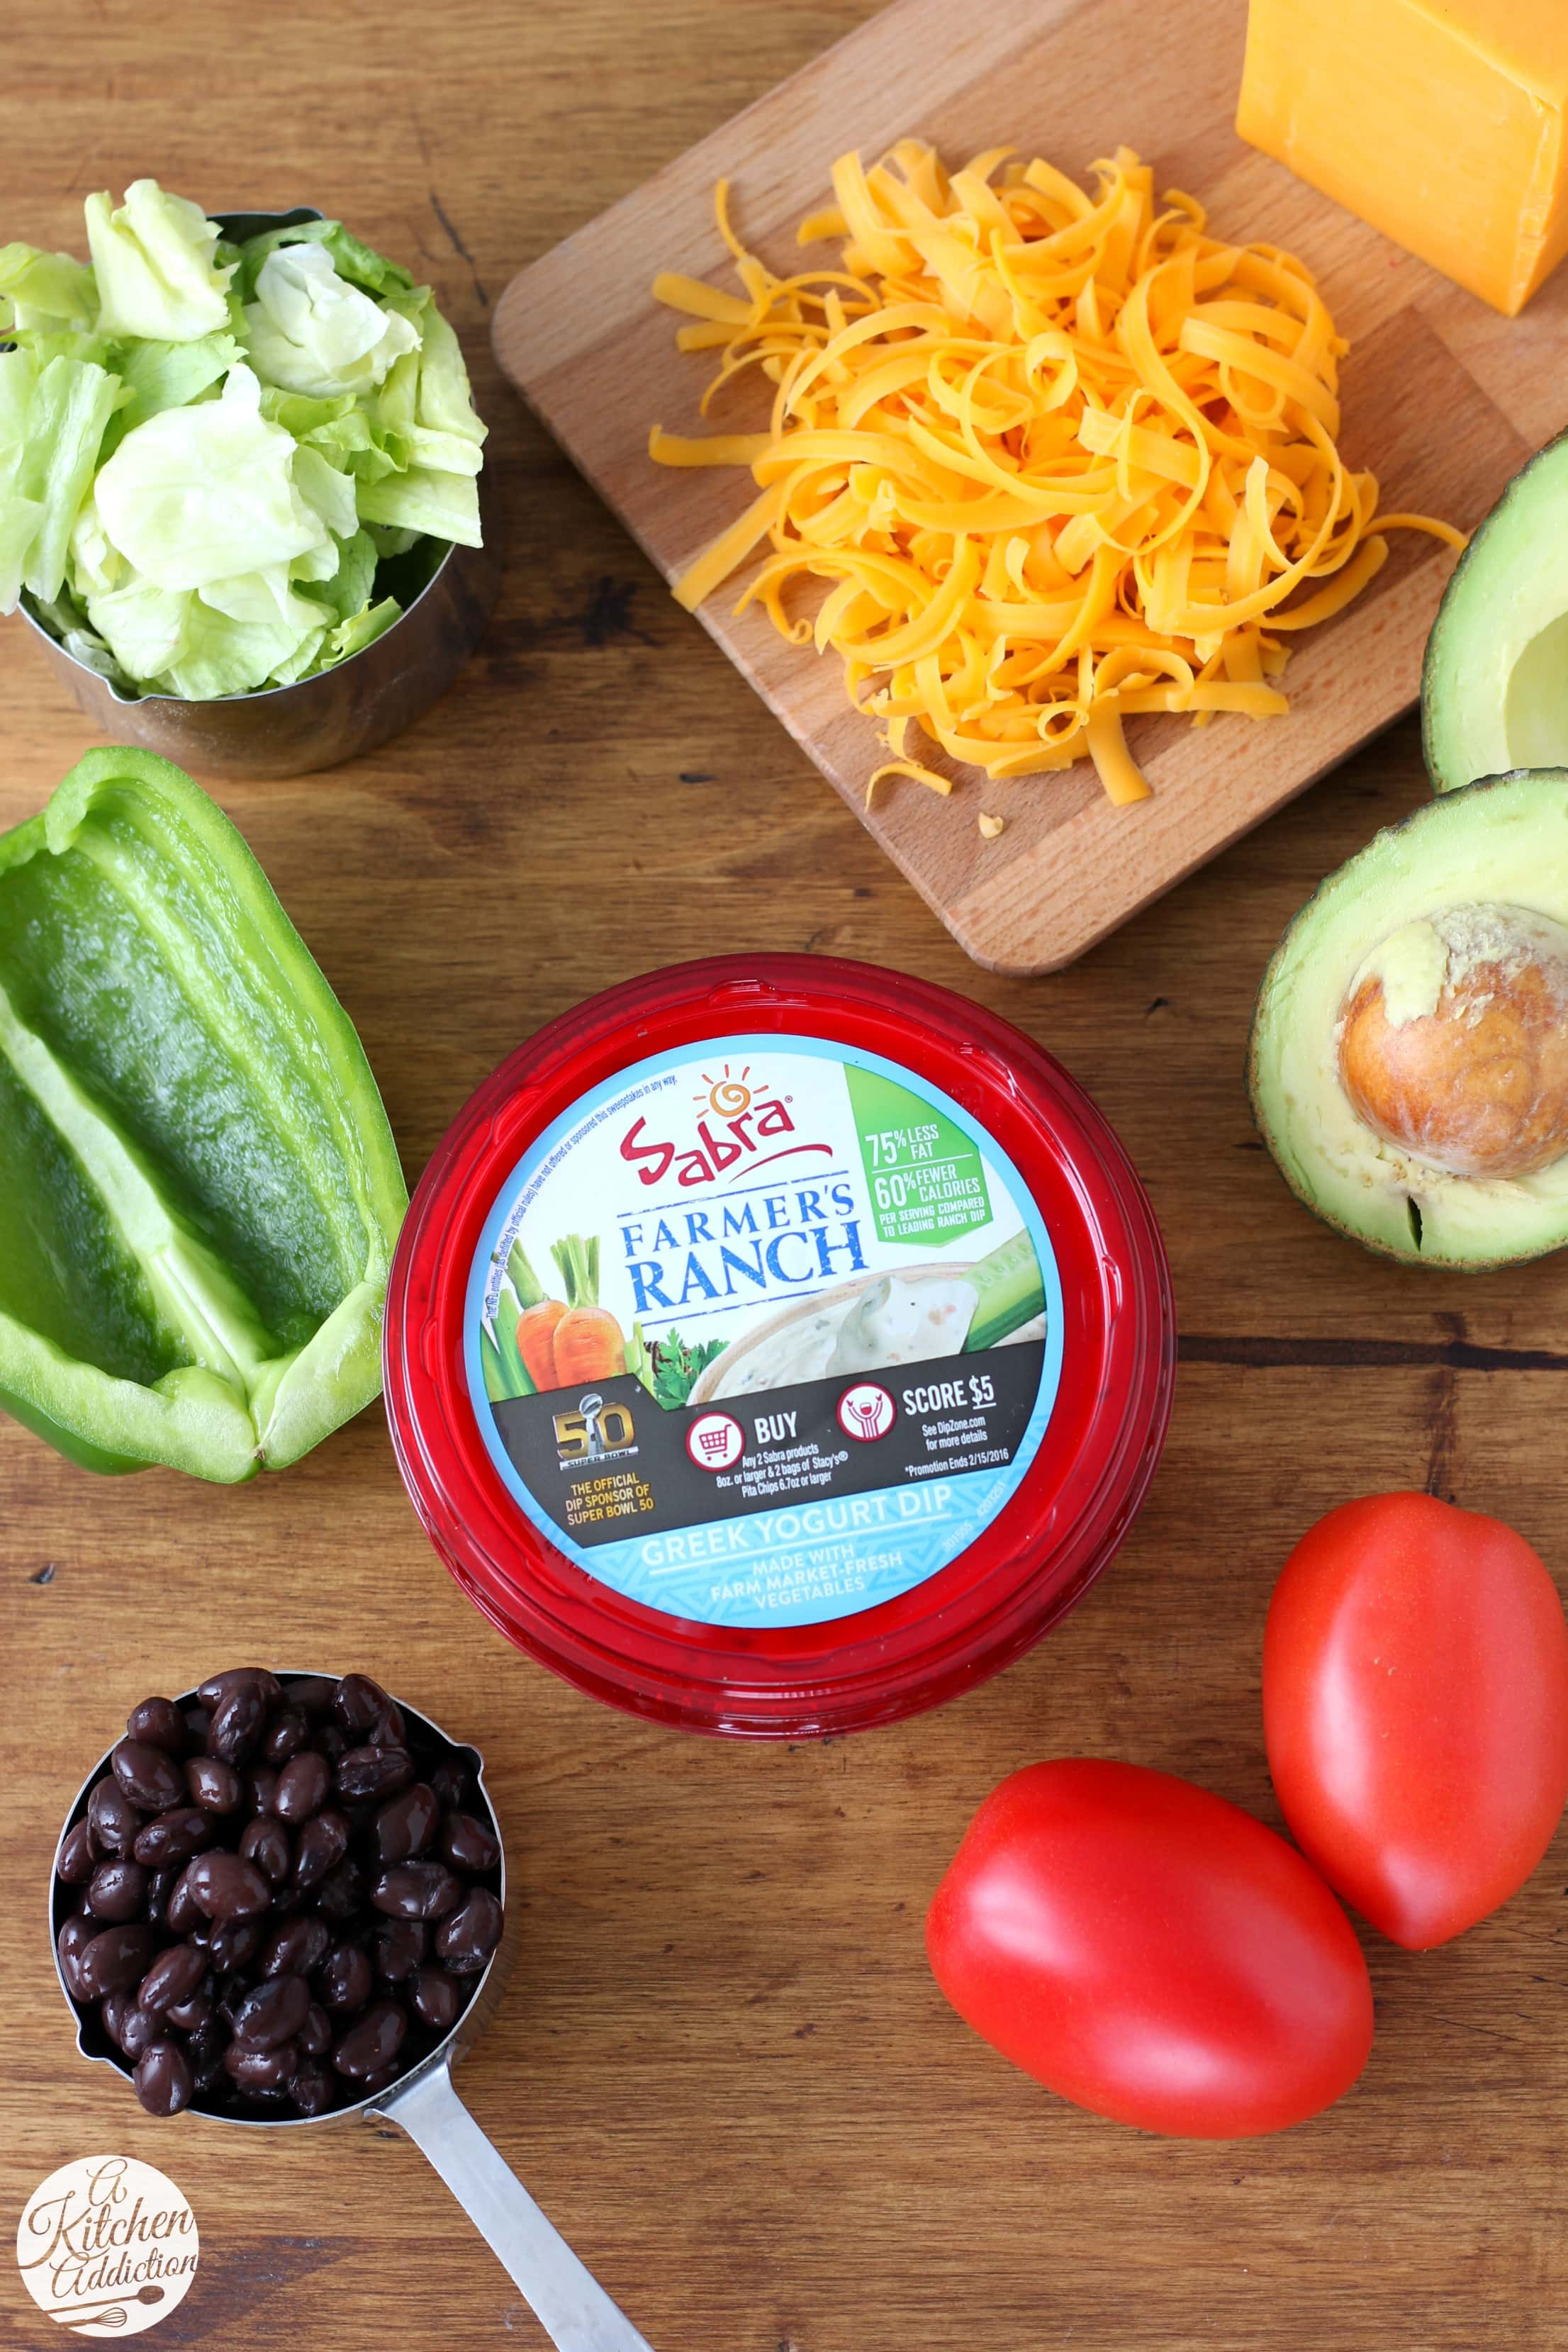 Sabra Farmer's Ranch Greek Yogurt Dip Game Day Appetizer